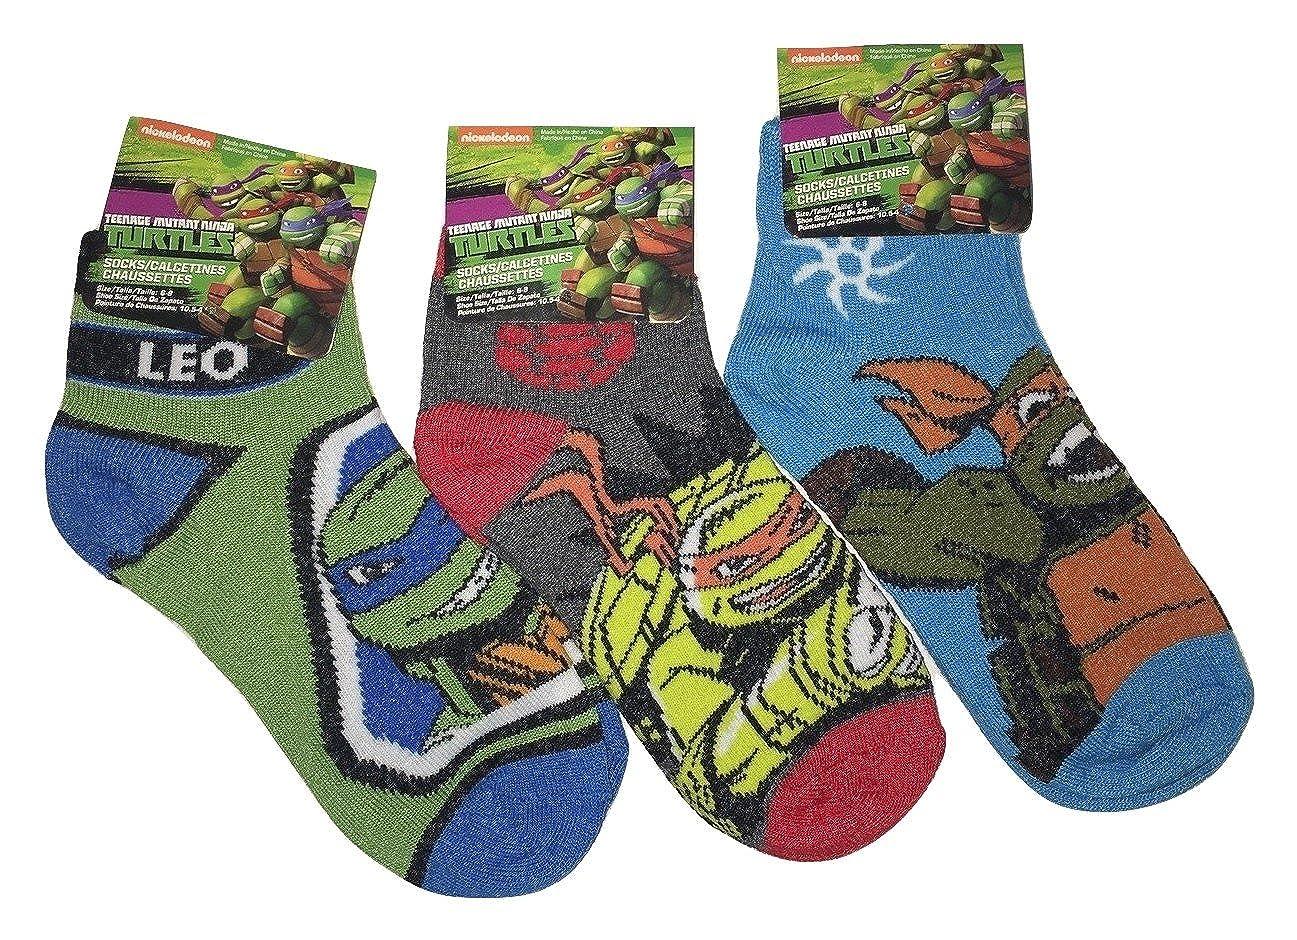 Amazon.com: Nickelodeon Teenage Mutant Ninja Turtles Youth Ankle Socks - 3 Pair, Size 6-8: Clothing